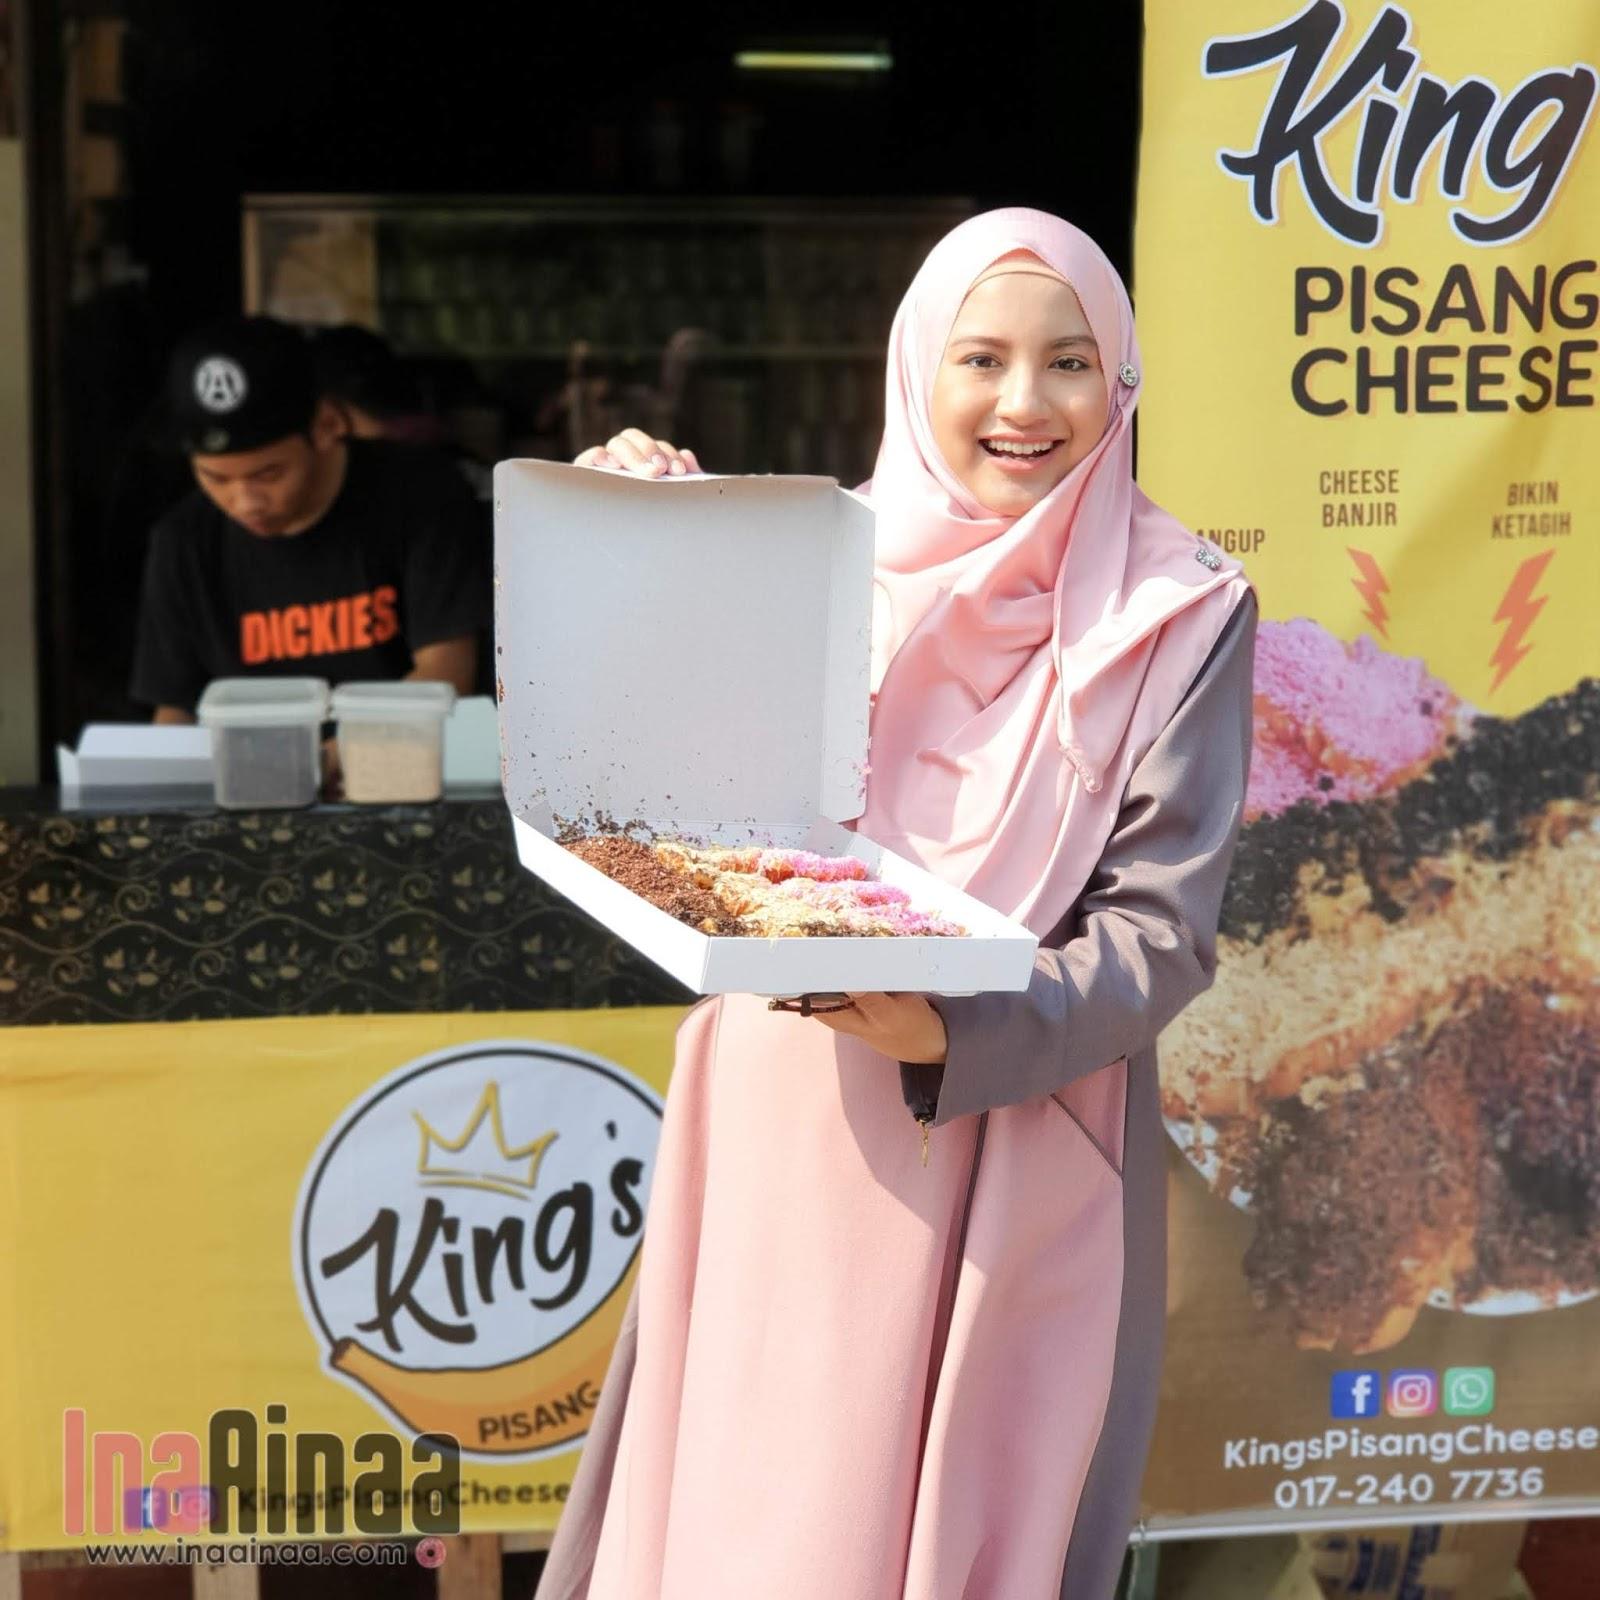 KING'S PISANG CHEESE BANTING - Hak Milik Ina Ainaa